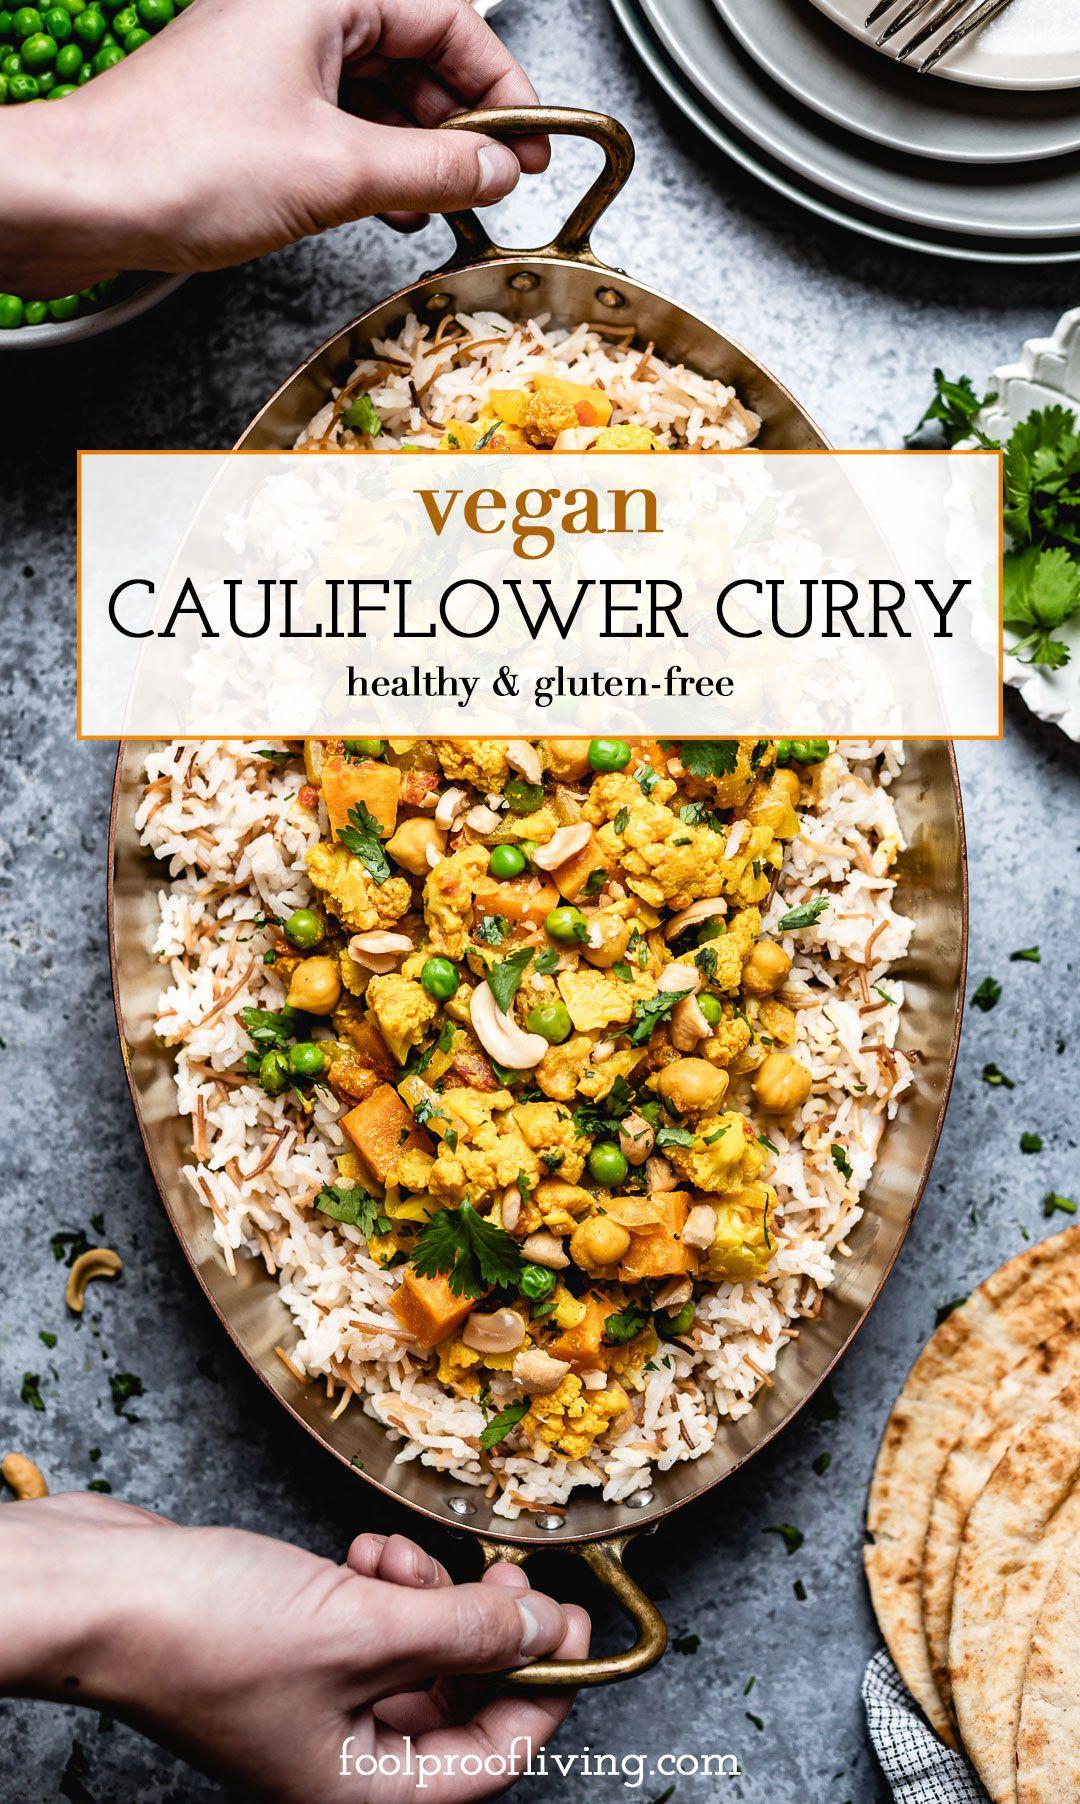 Cauliflower Curry With Coconut Milk Recipe In 2020 Curry Recipes Recipes Vegetarian Vegan Recipes